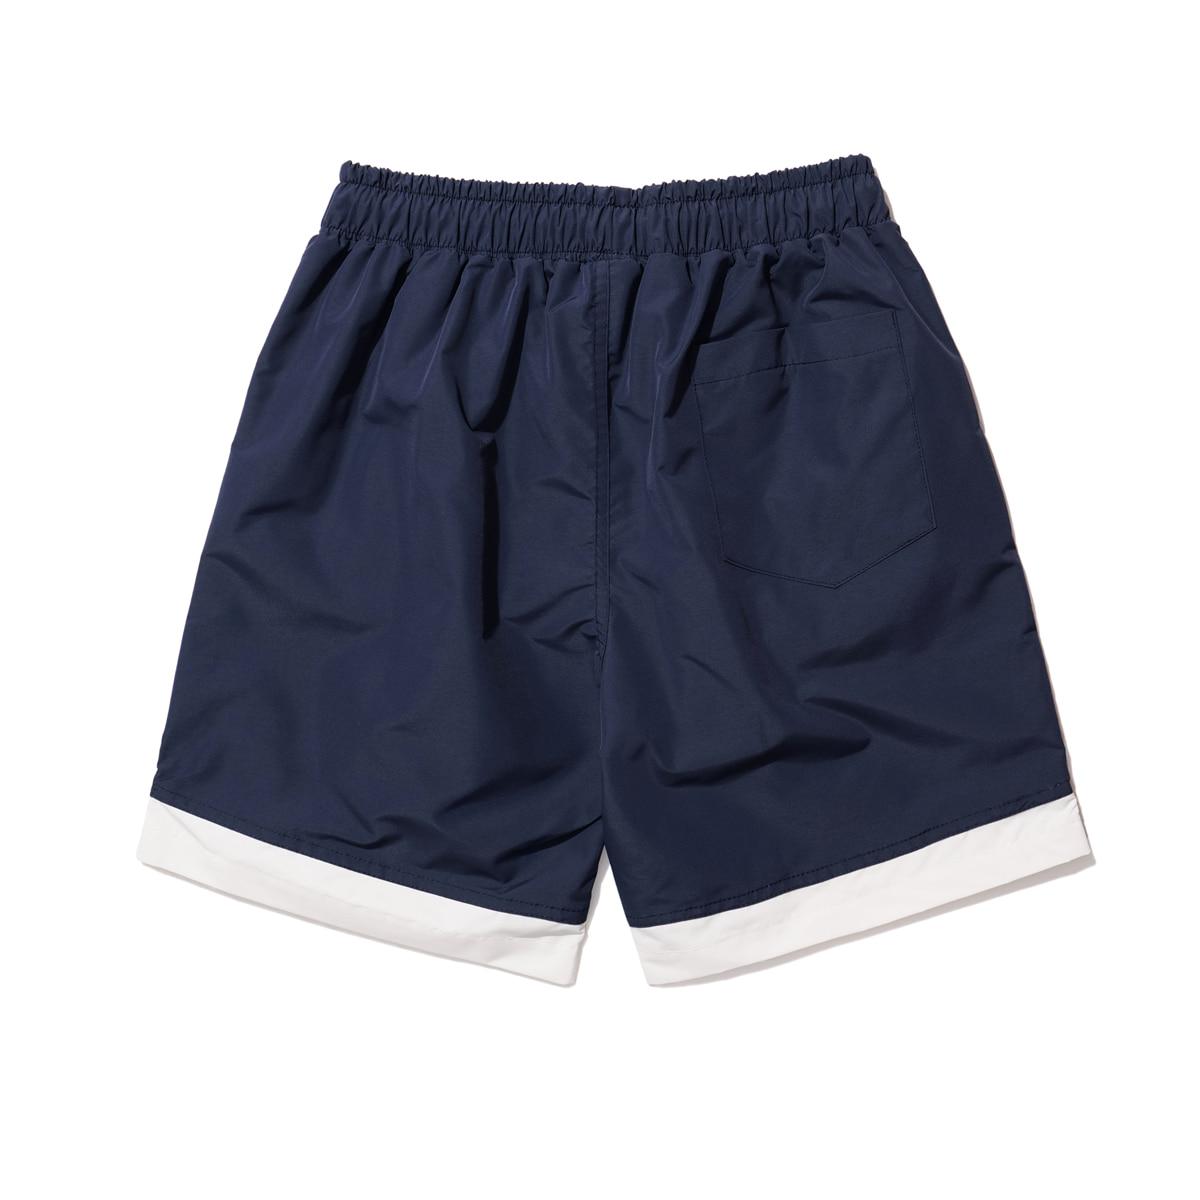 Mod01 Reflective Shorts (navy)